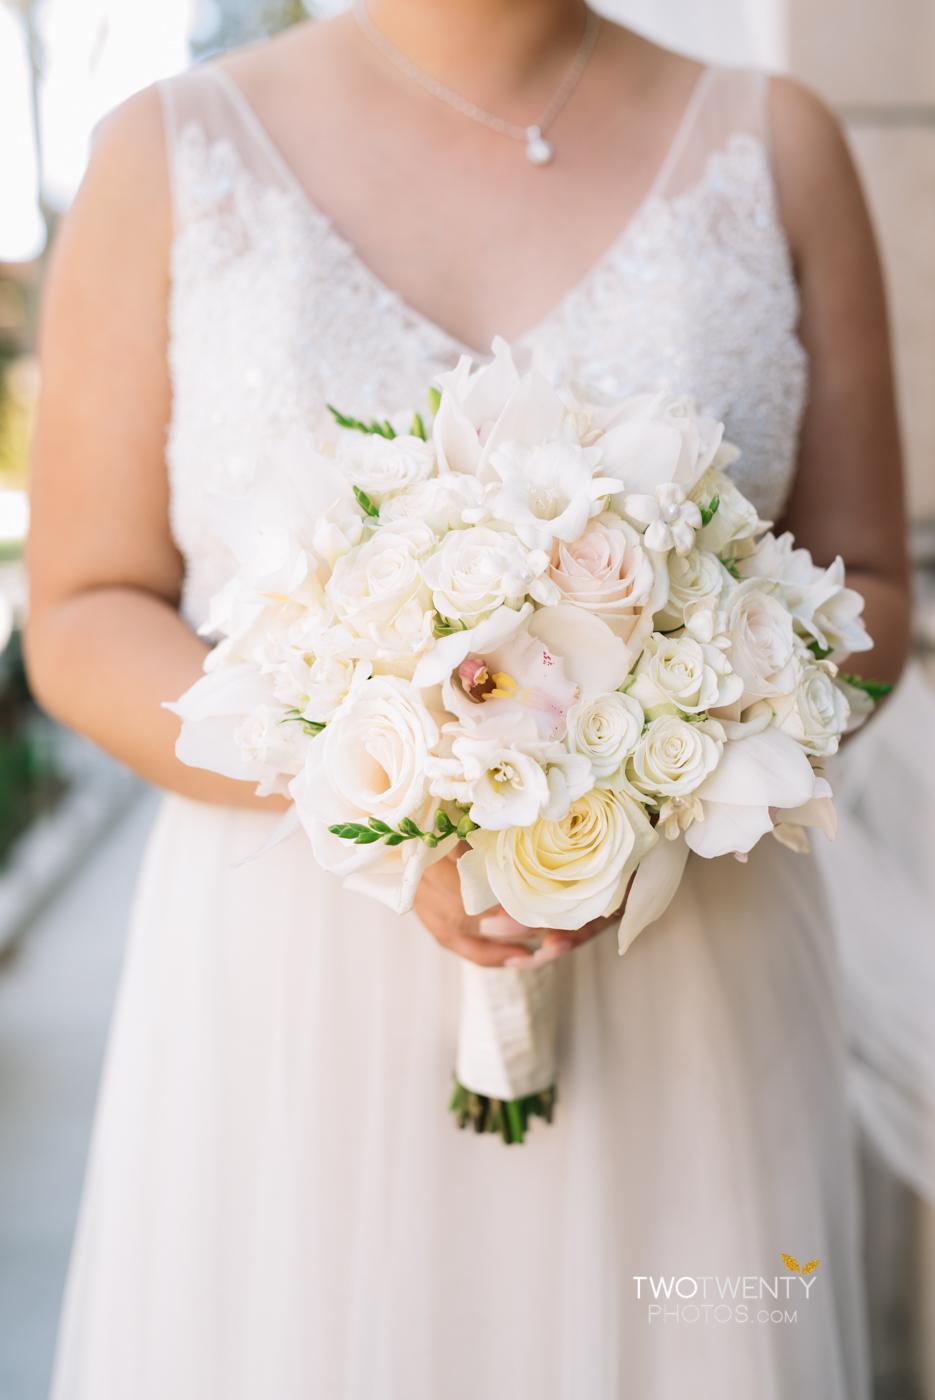 university-pacific-stockton-sacramento-wedding-photographer_-77